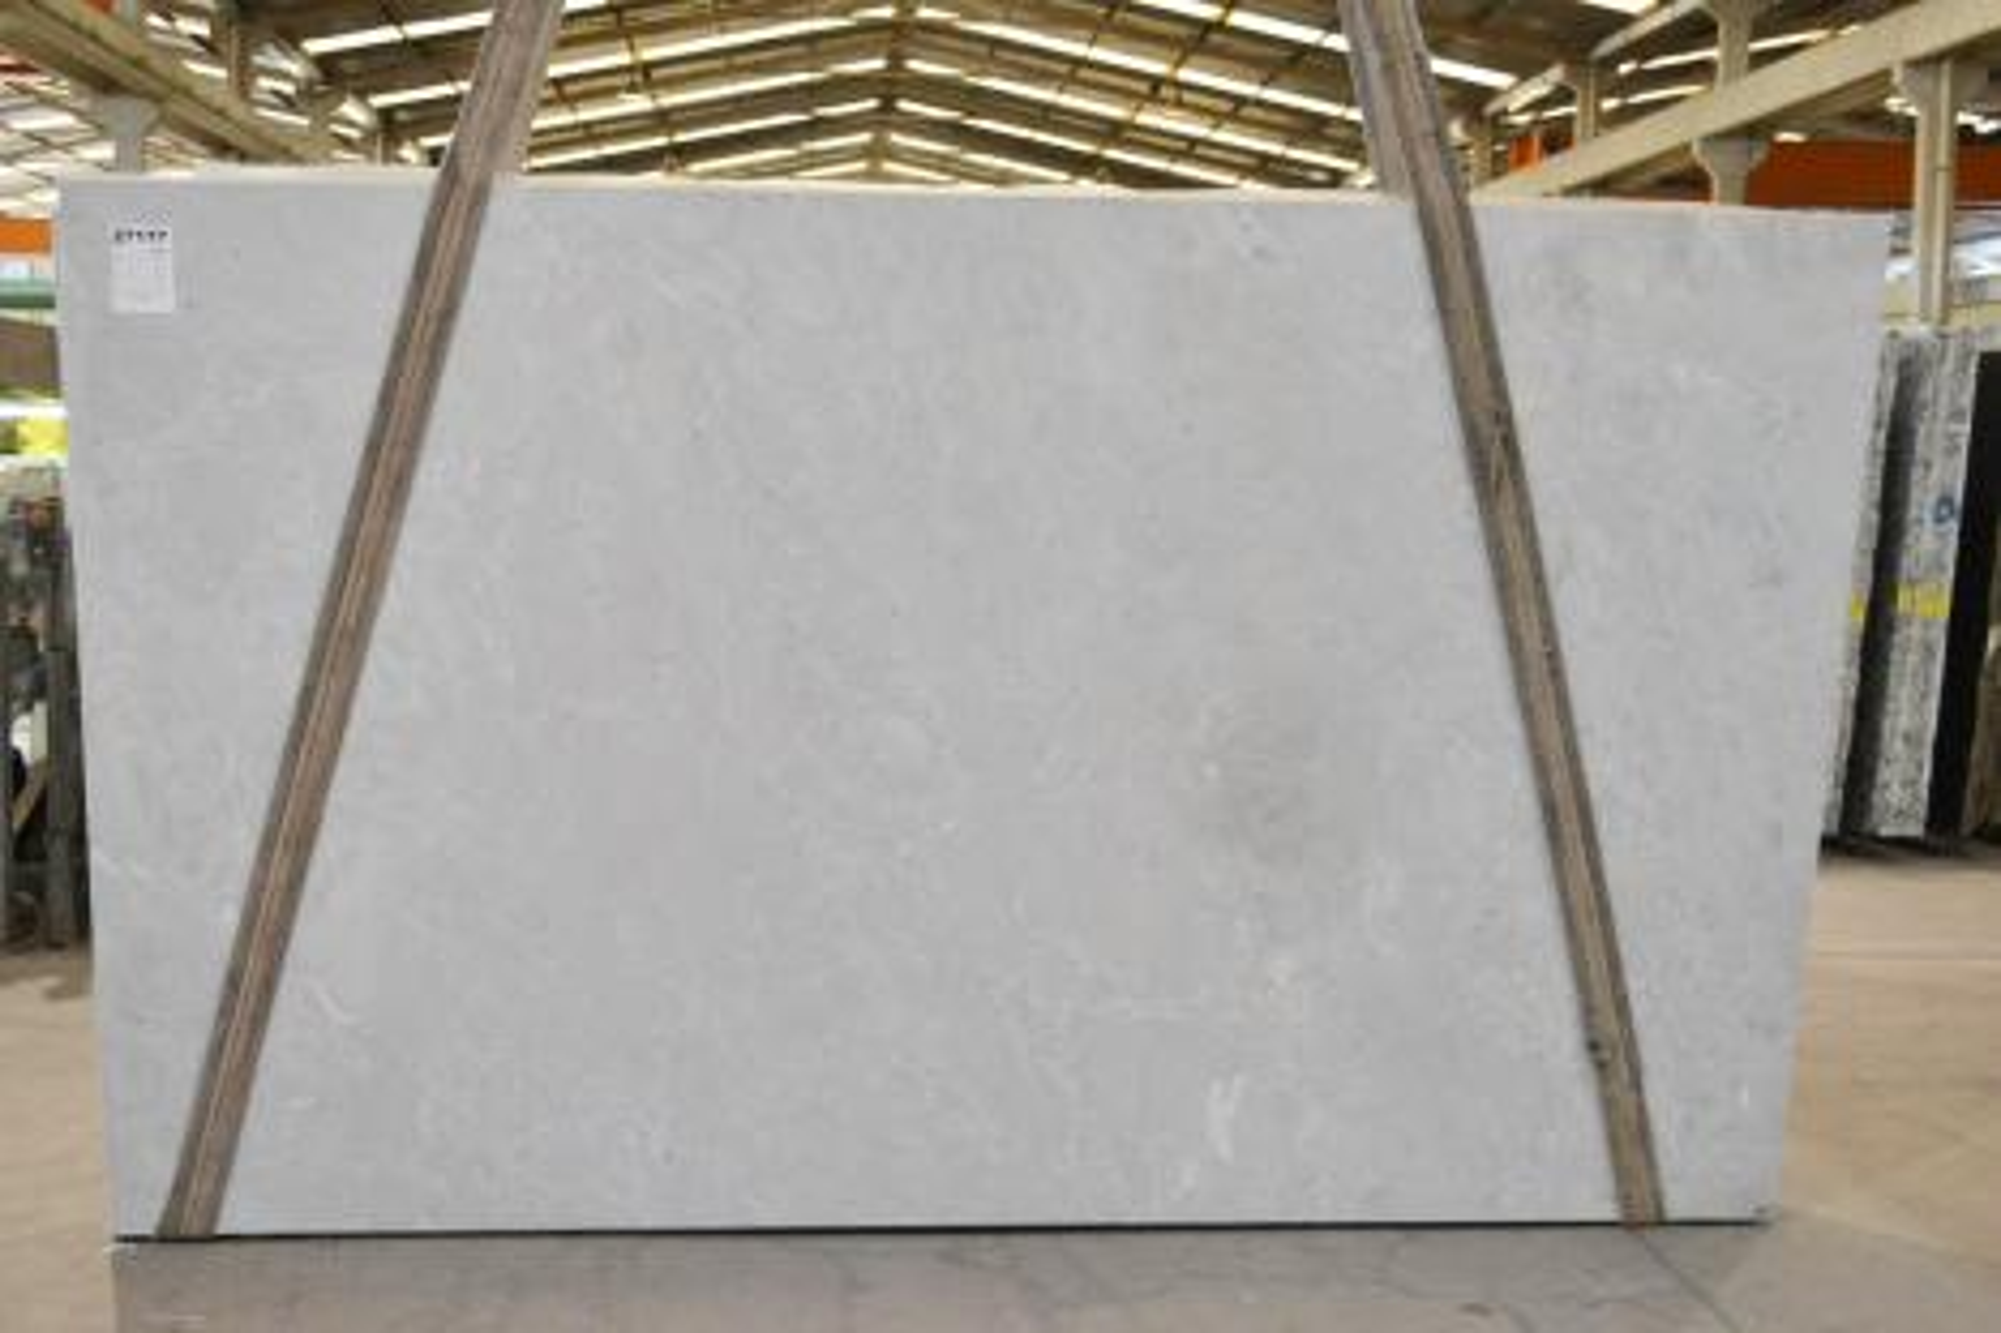 Brazilian Dolomite Supply Espirito Santo (Brazil) polished slabs 2465 , Bnd #27177 natural Dolomite